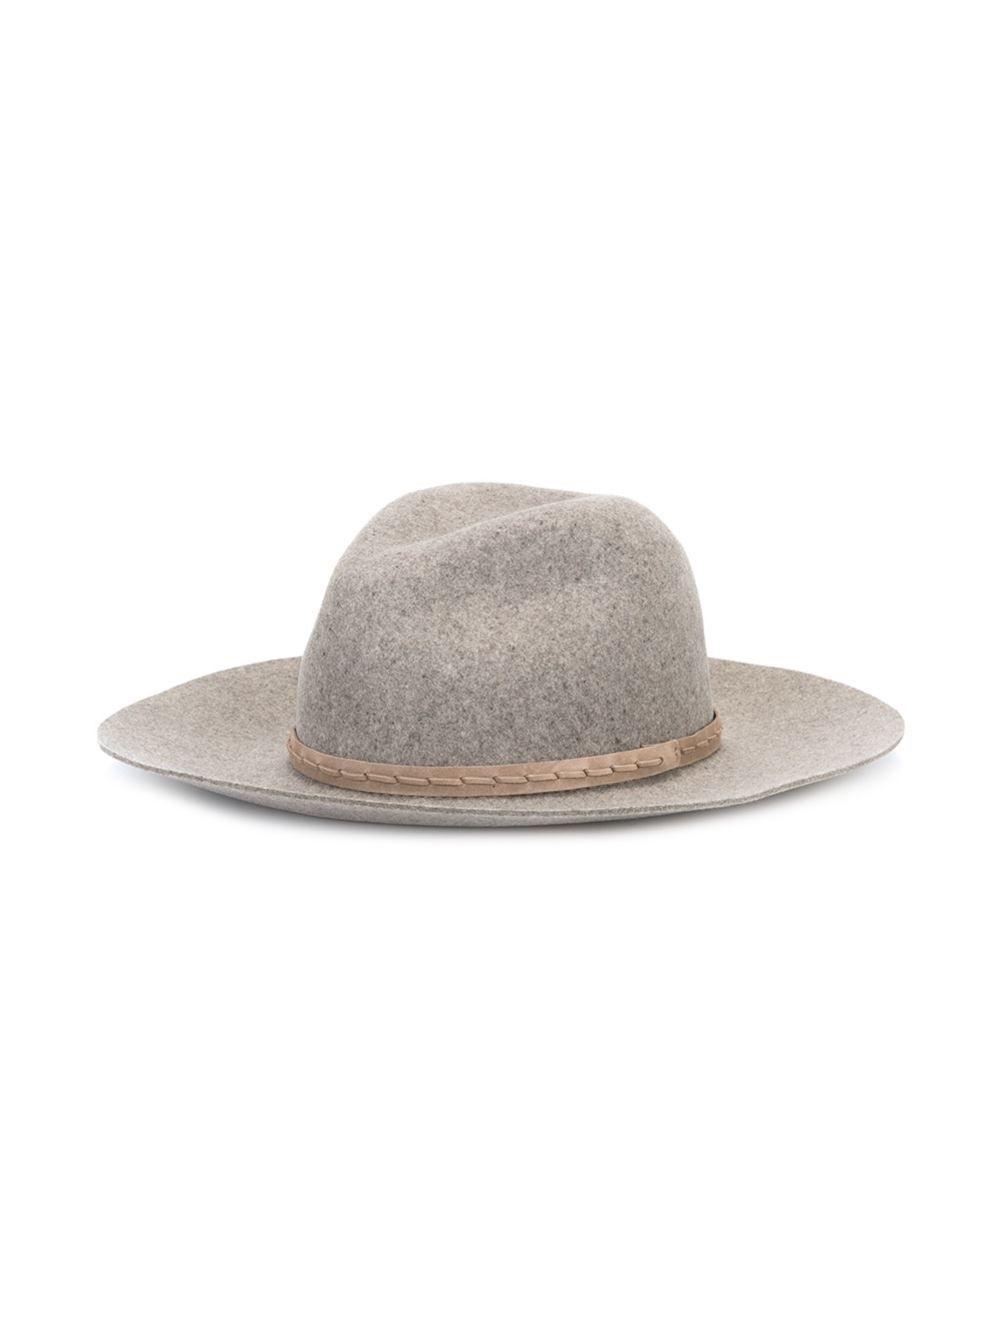 #rag&bone #fedora #grey #hat #women #fashion #newin #style www.jofre.eu